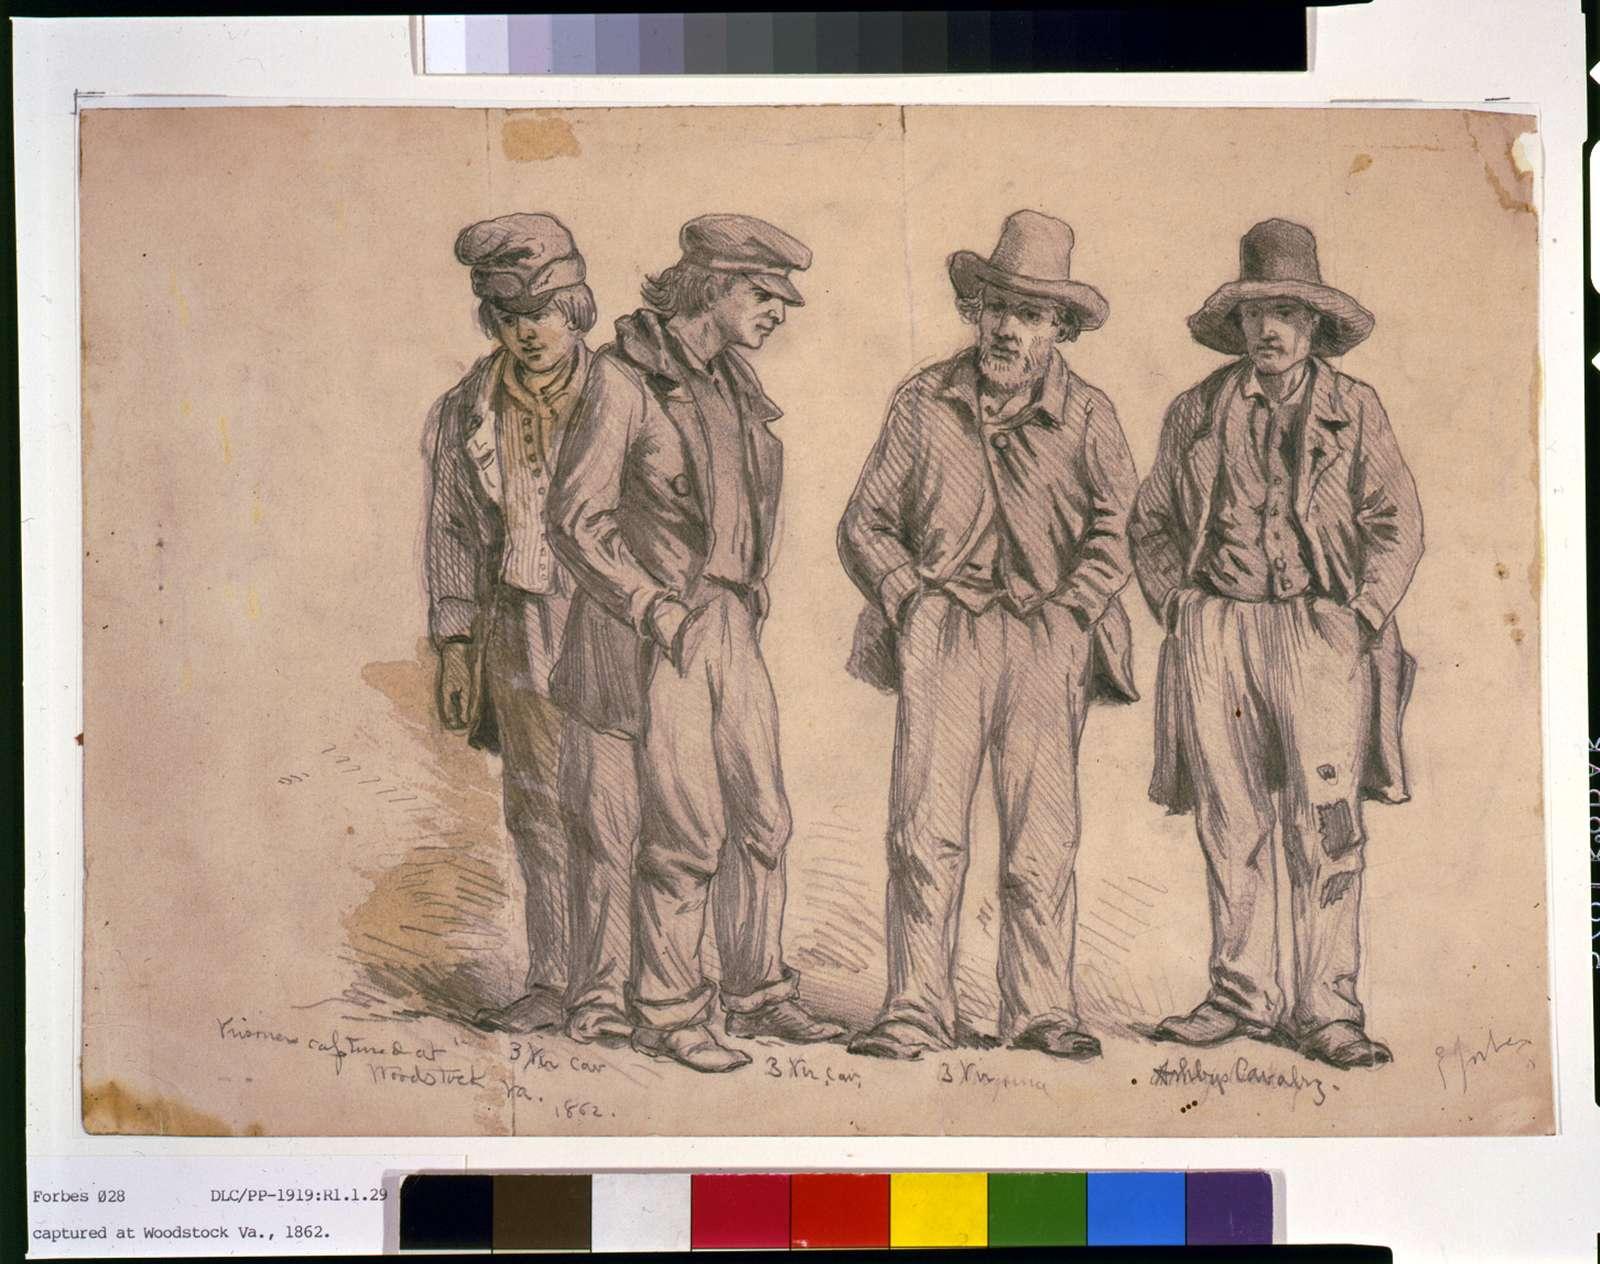 Prisoners captured at Woodstock, Va. / E. Forbes.